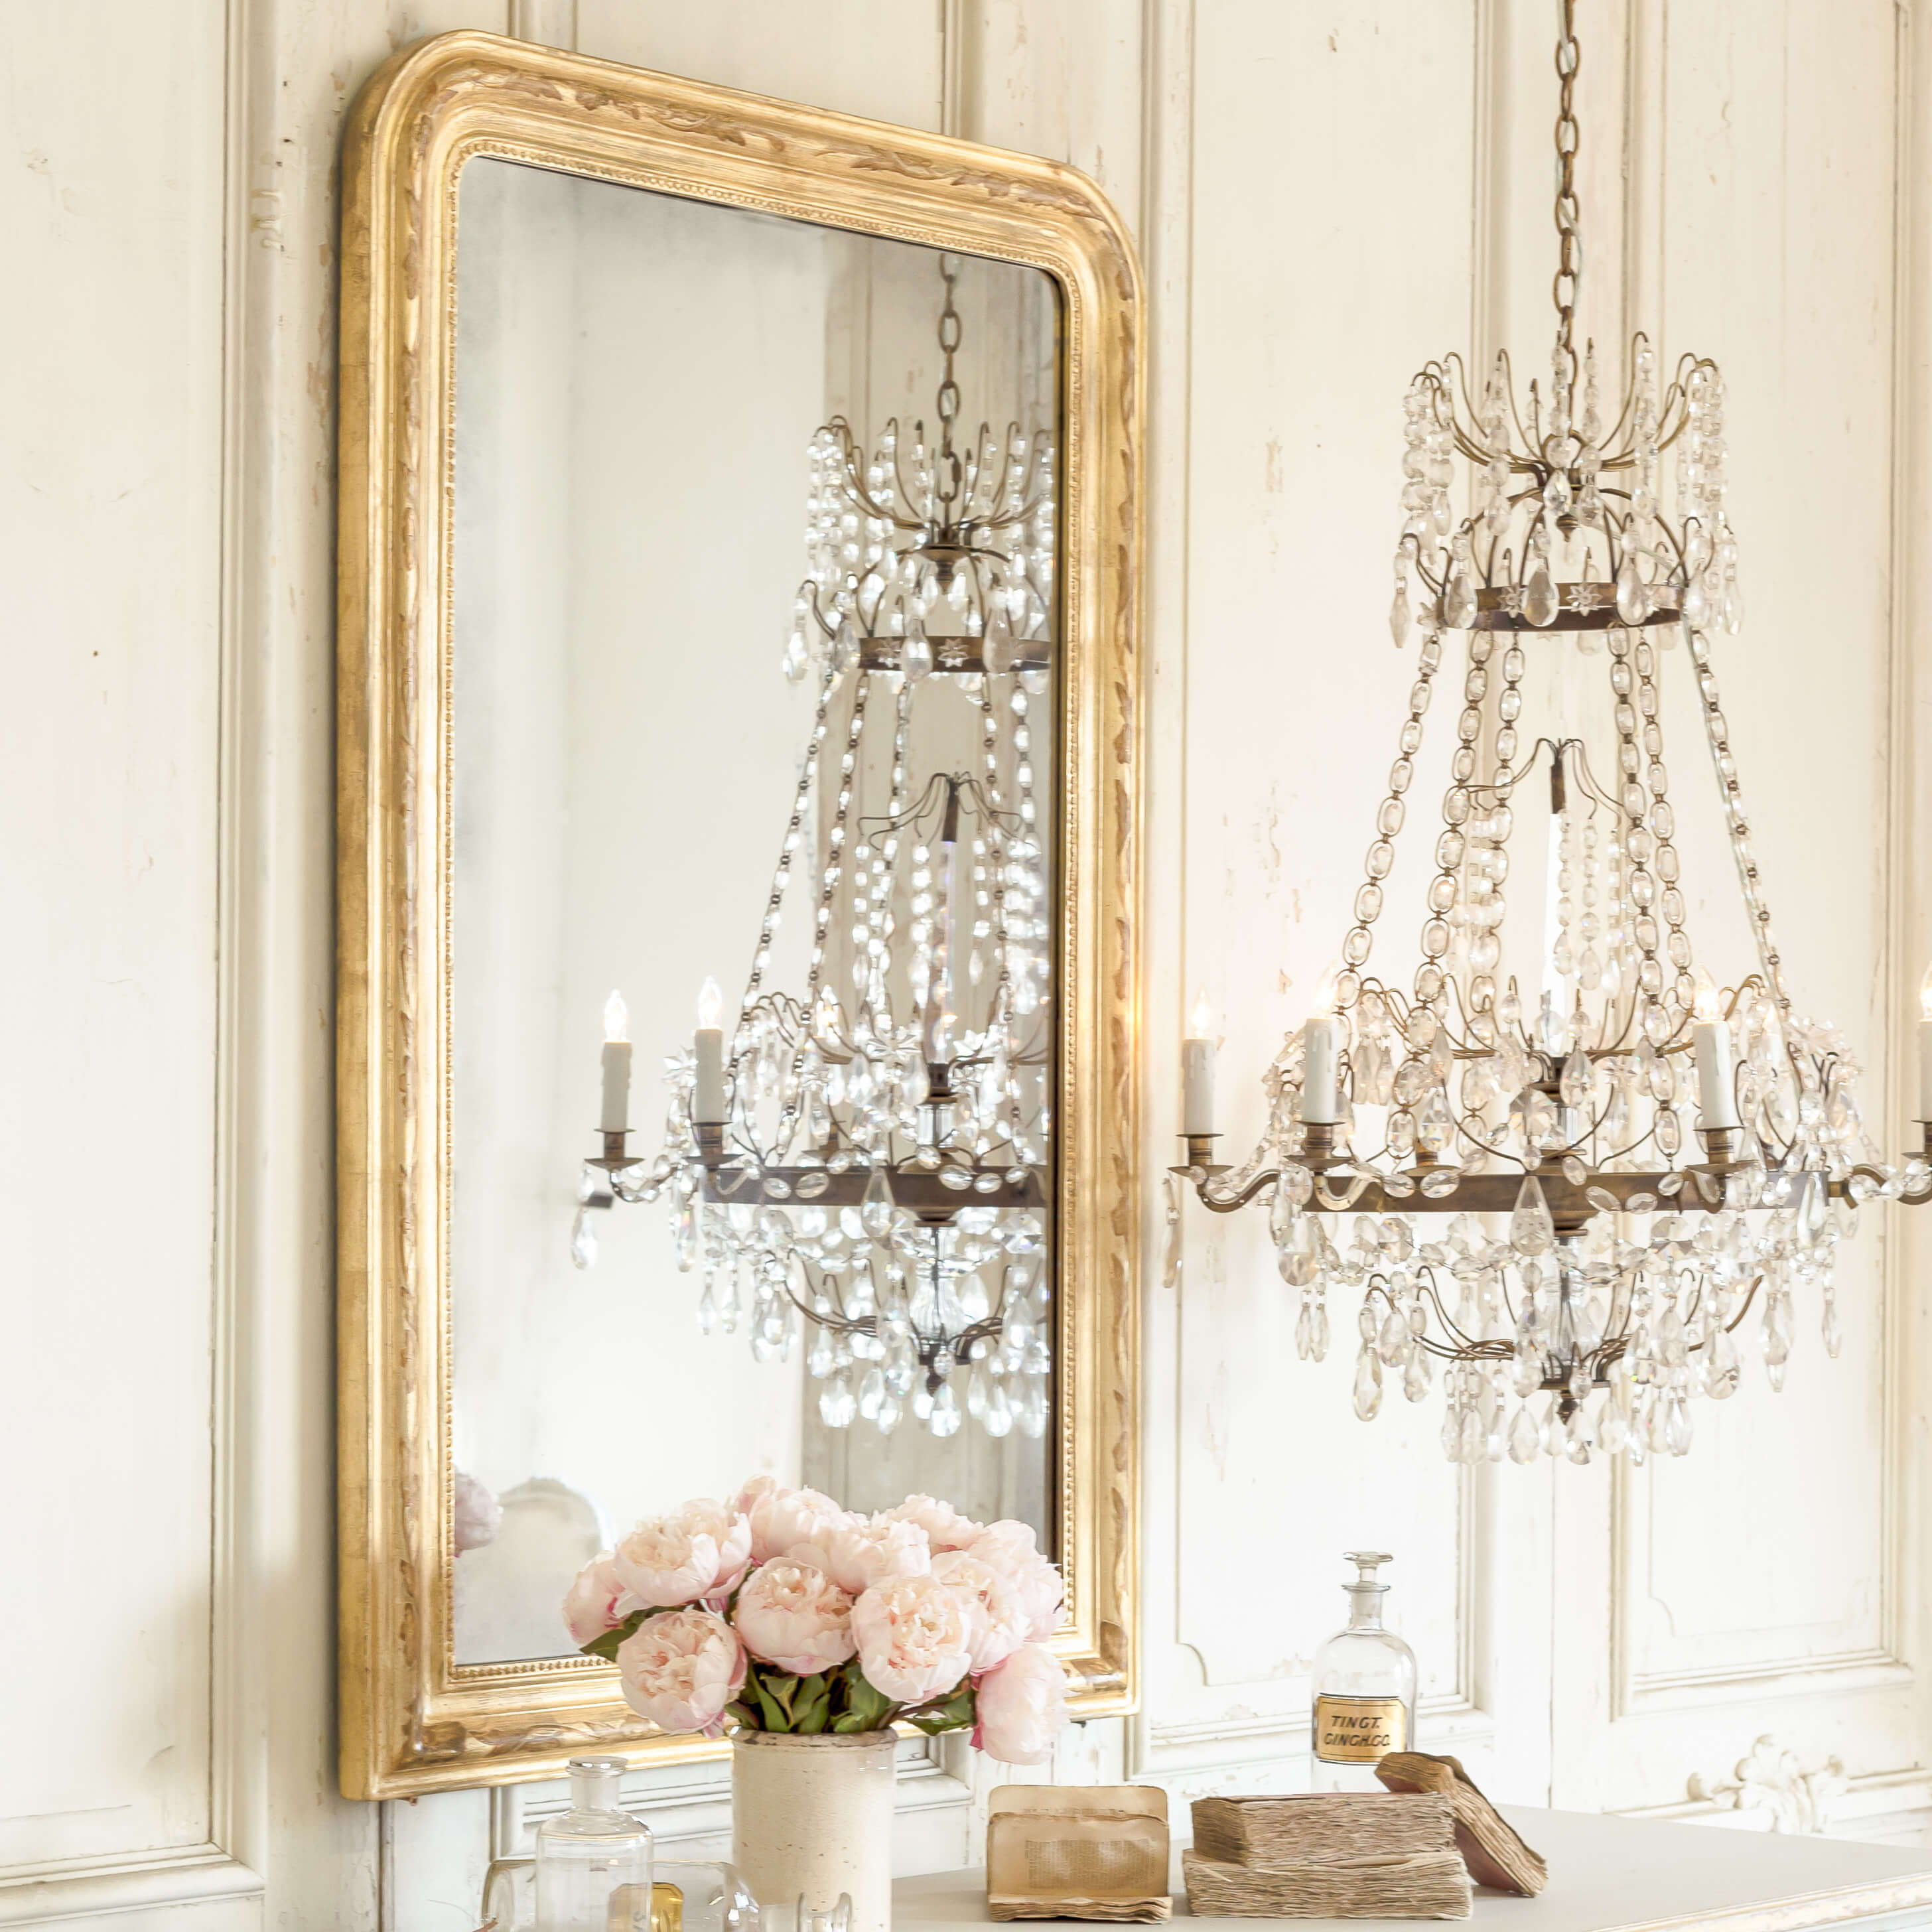 Hanging Mirrors